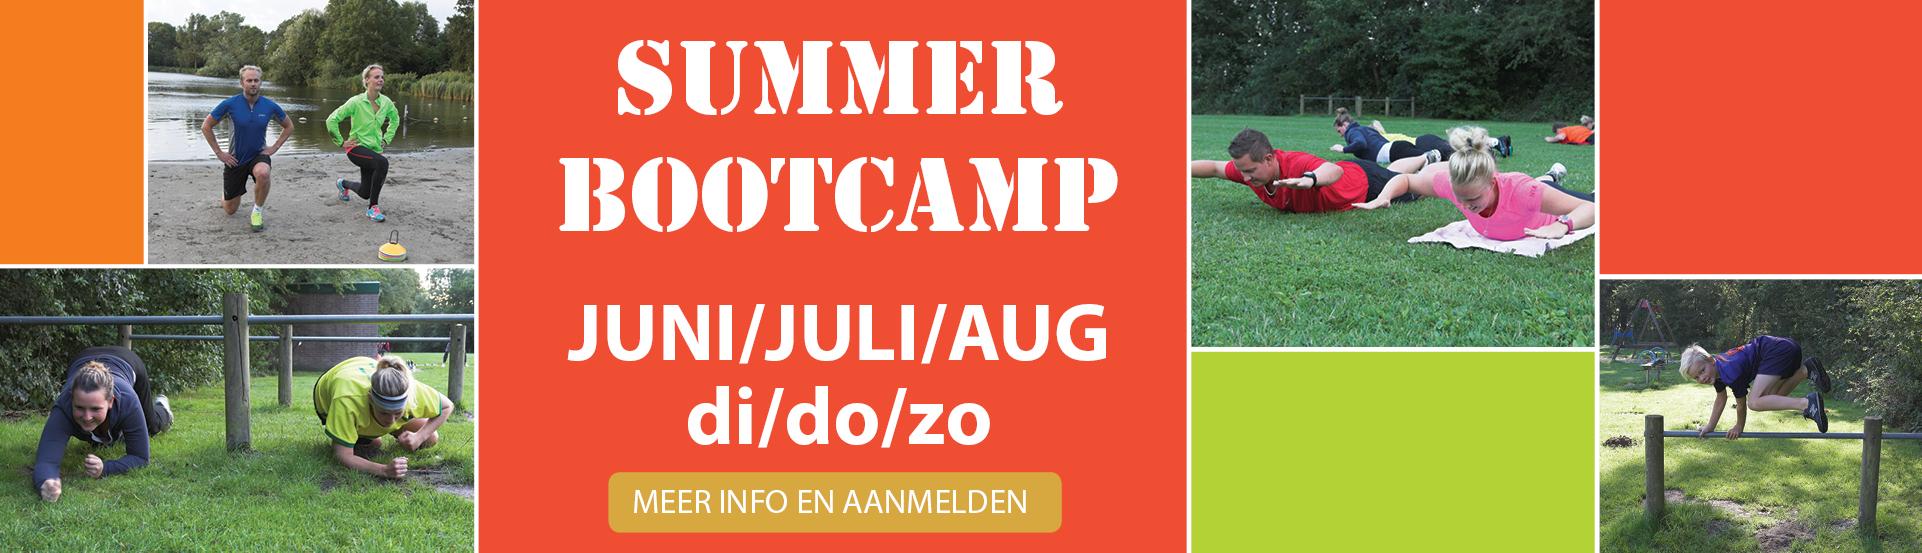 slider-zomer-bootcamp-Sportstudio-de-Boer